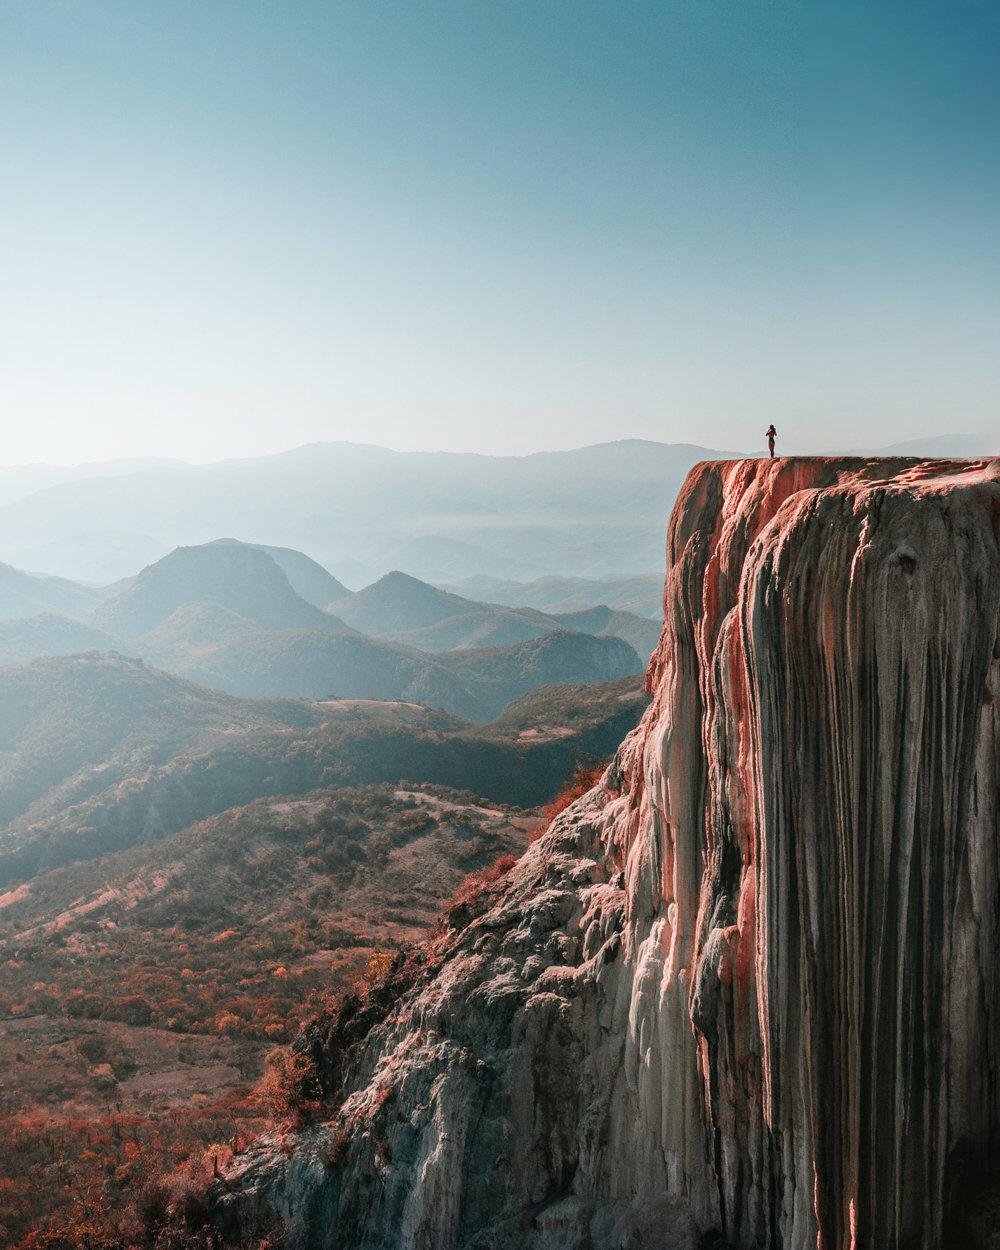 Mexico From Above Aerial Photography Series By Dimitar Karanikolov 5